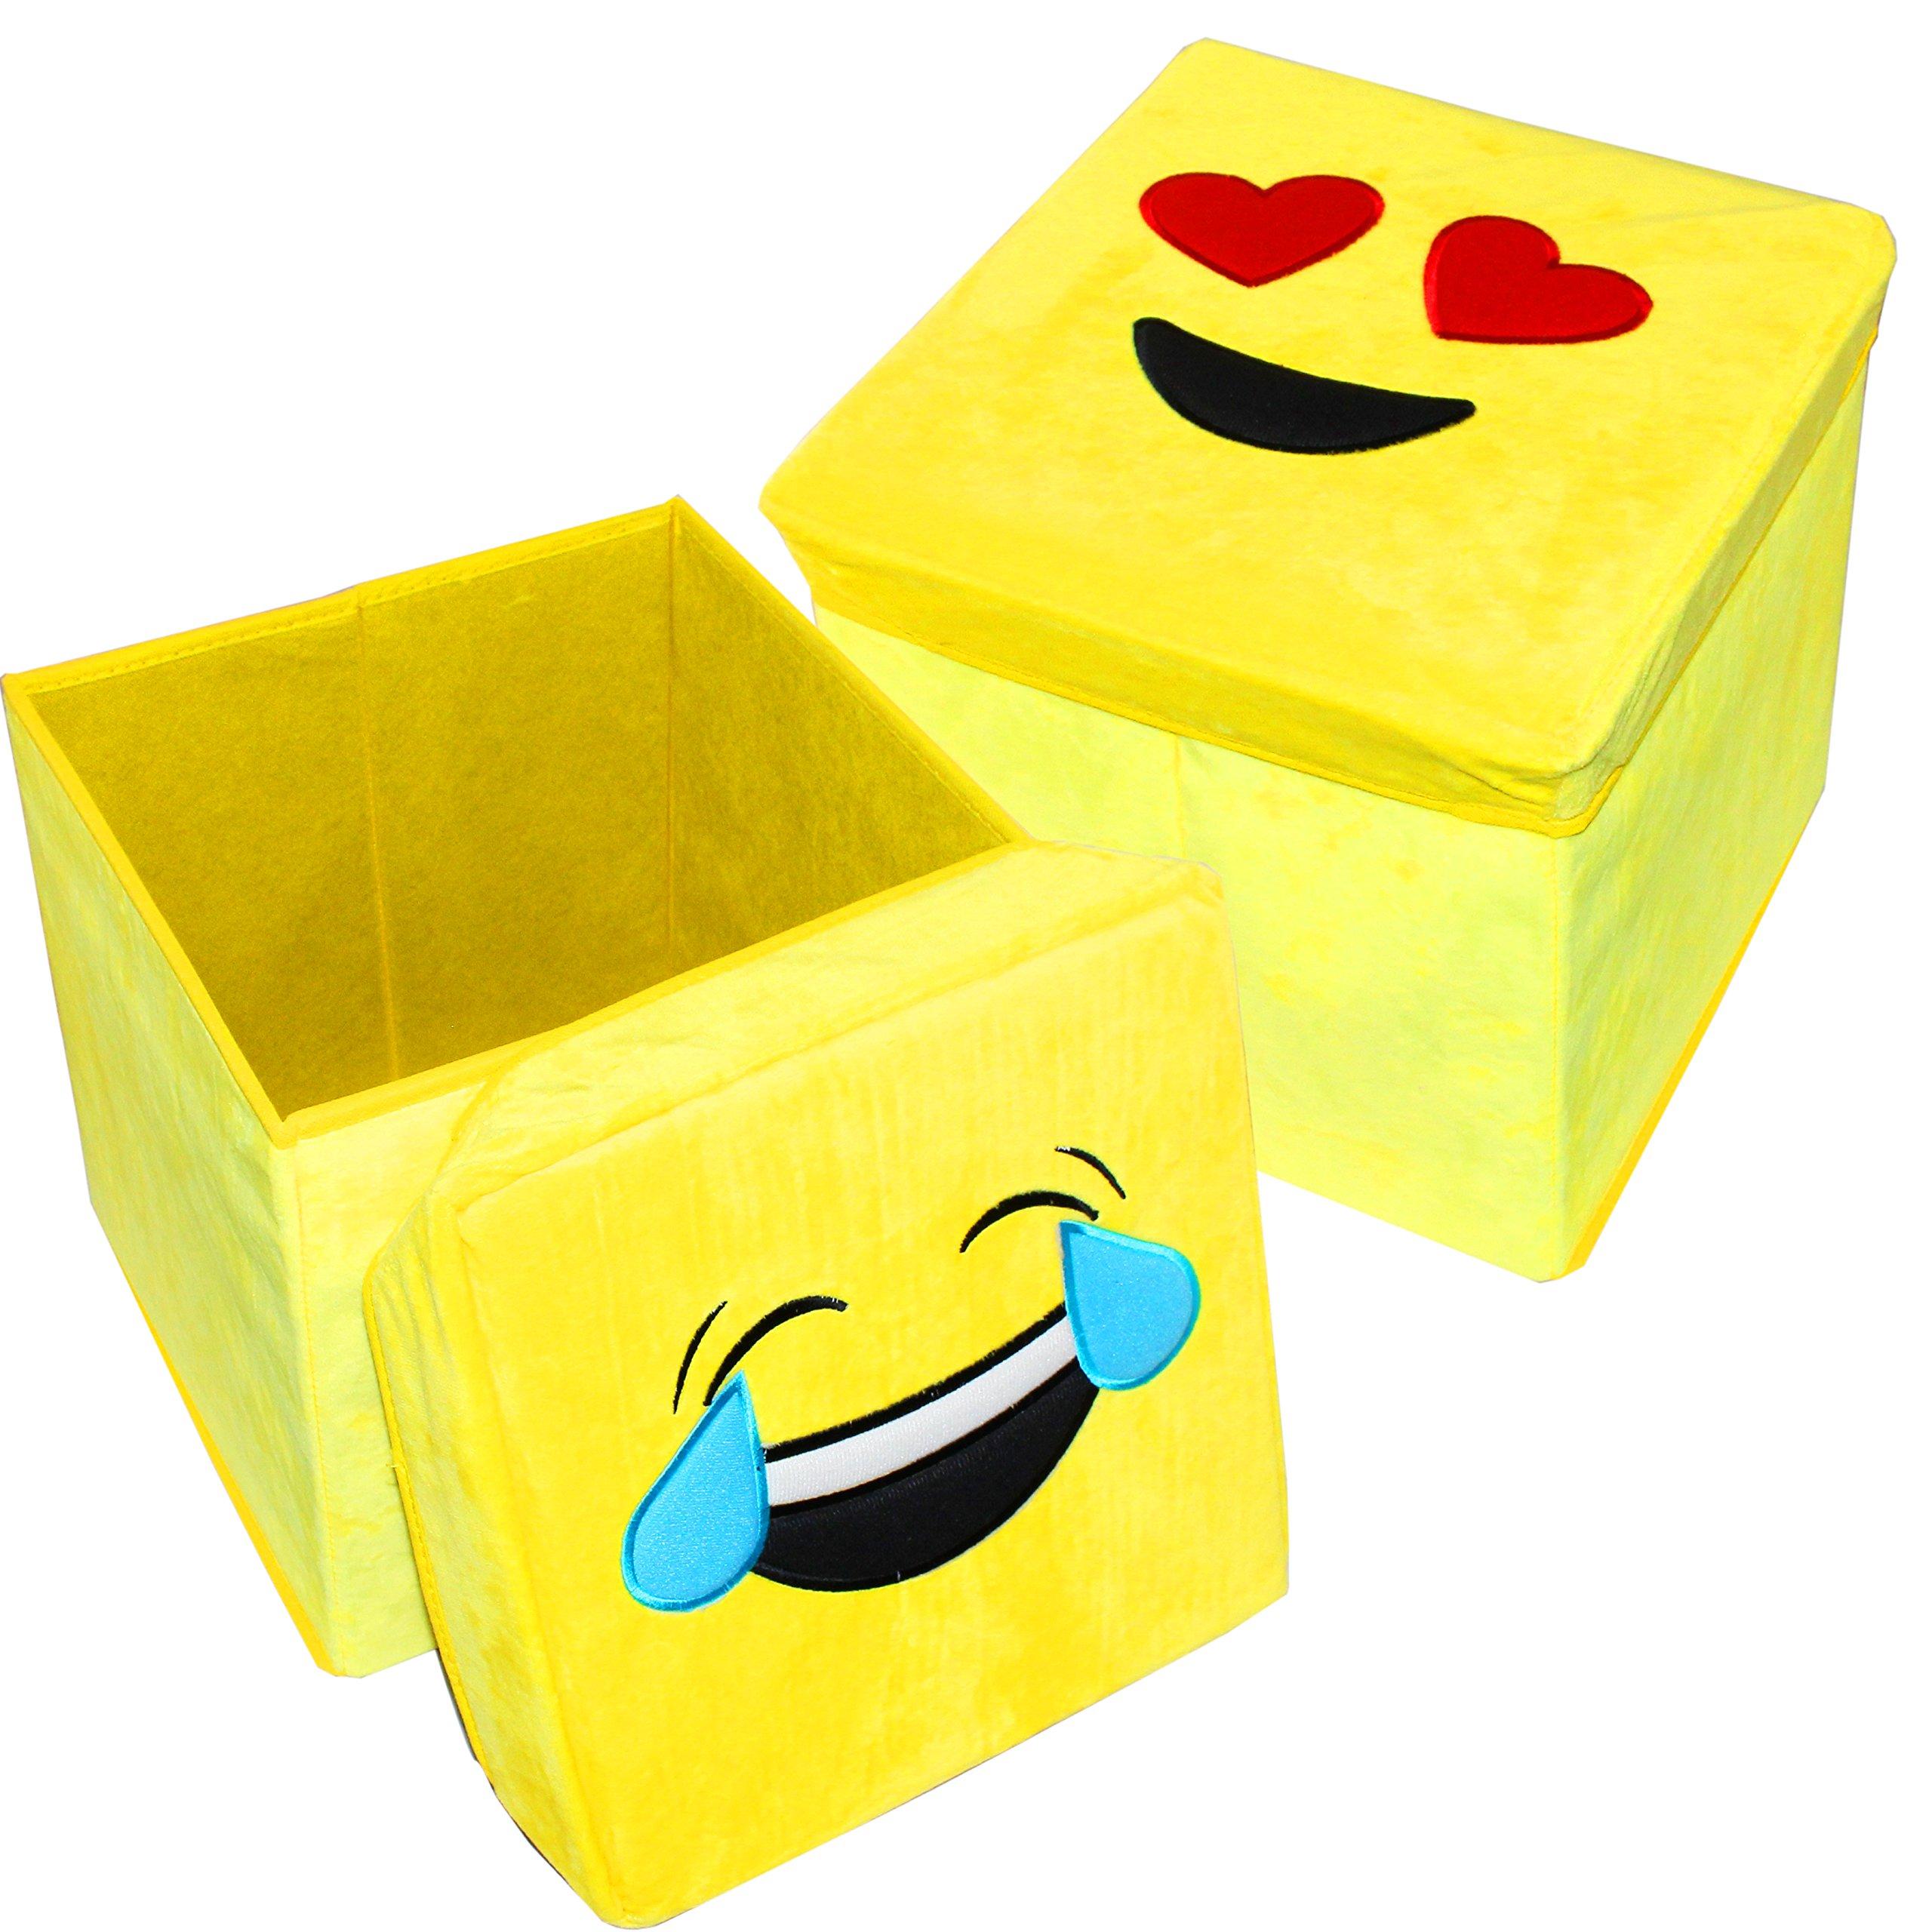 Joyin Toy Pack of 2 Emoji Toy Storage Chest Collapsible Folding Organizer Storage Ottoman Children Seat